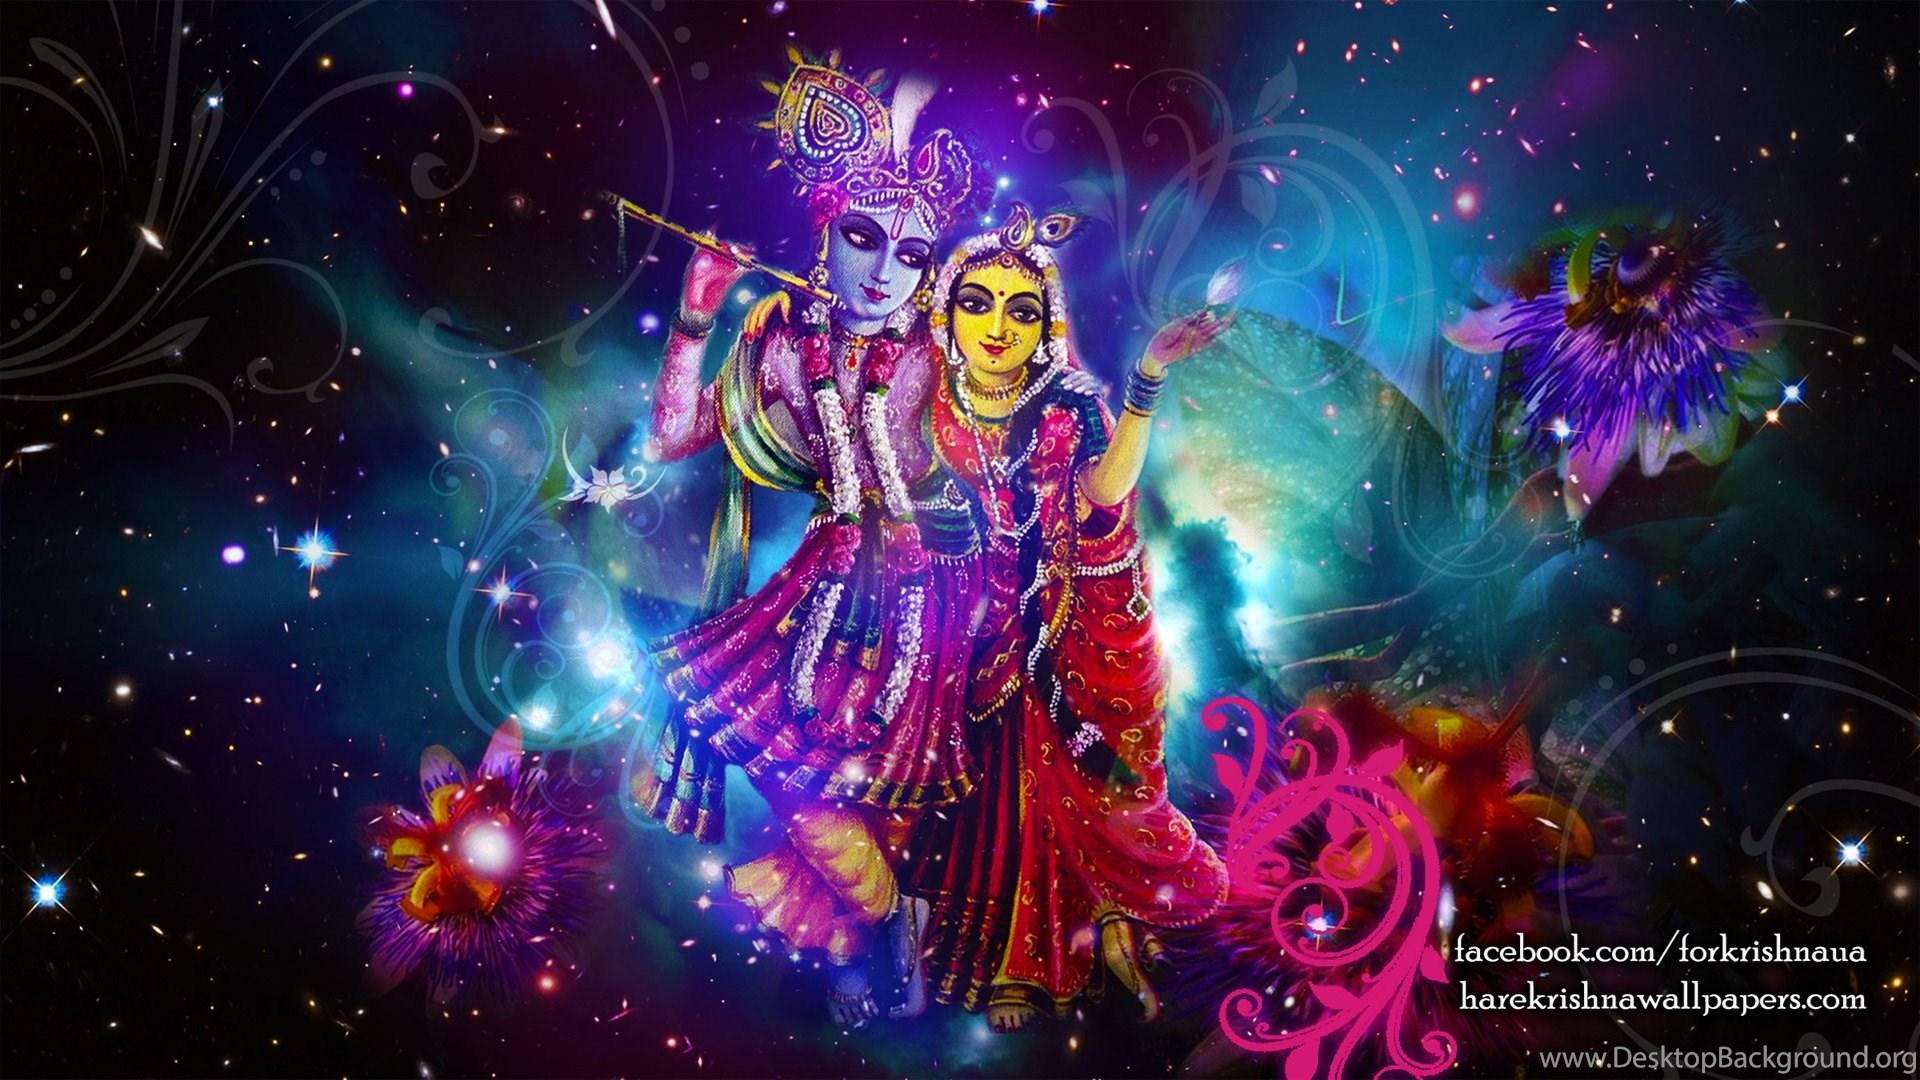 Radha Krishna Wallpapers 010 Size 1920 1080 Download Desktop Background